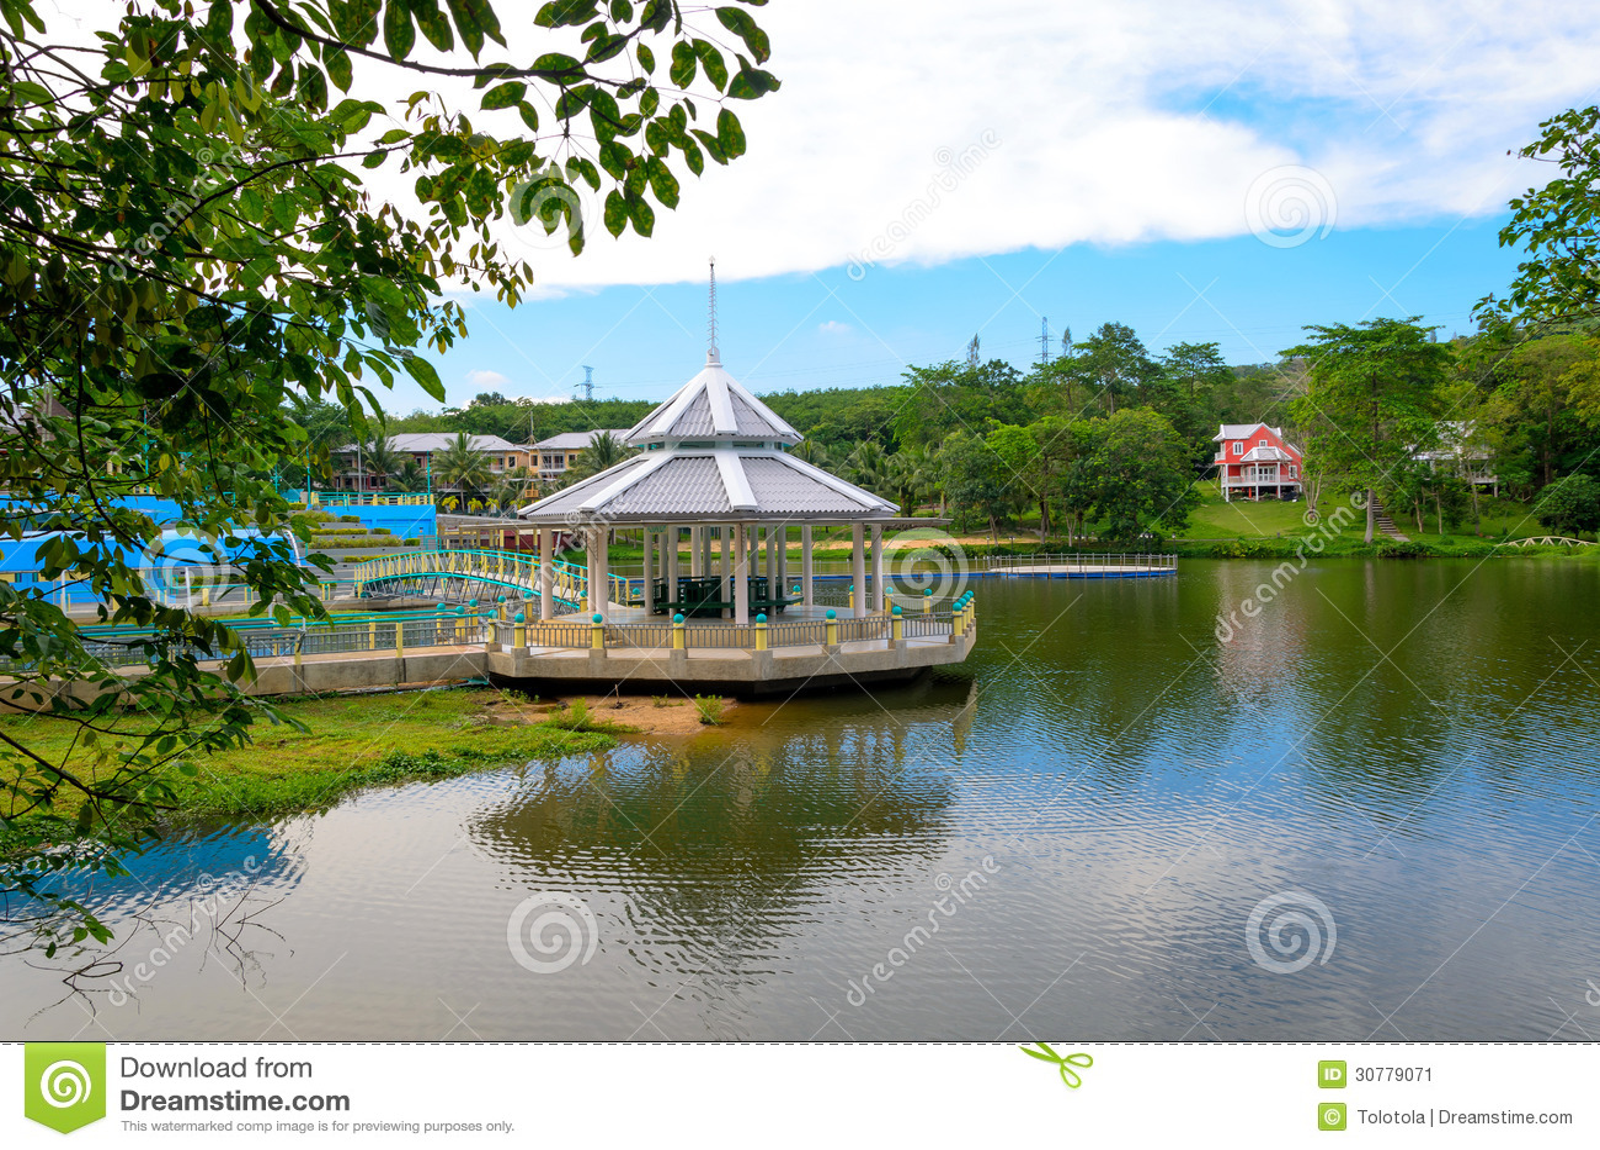 Lakeside house stock image image of china blue for Lakeside home